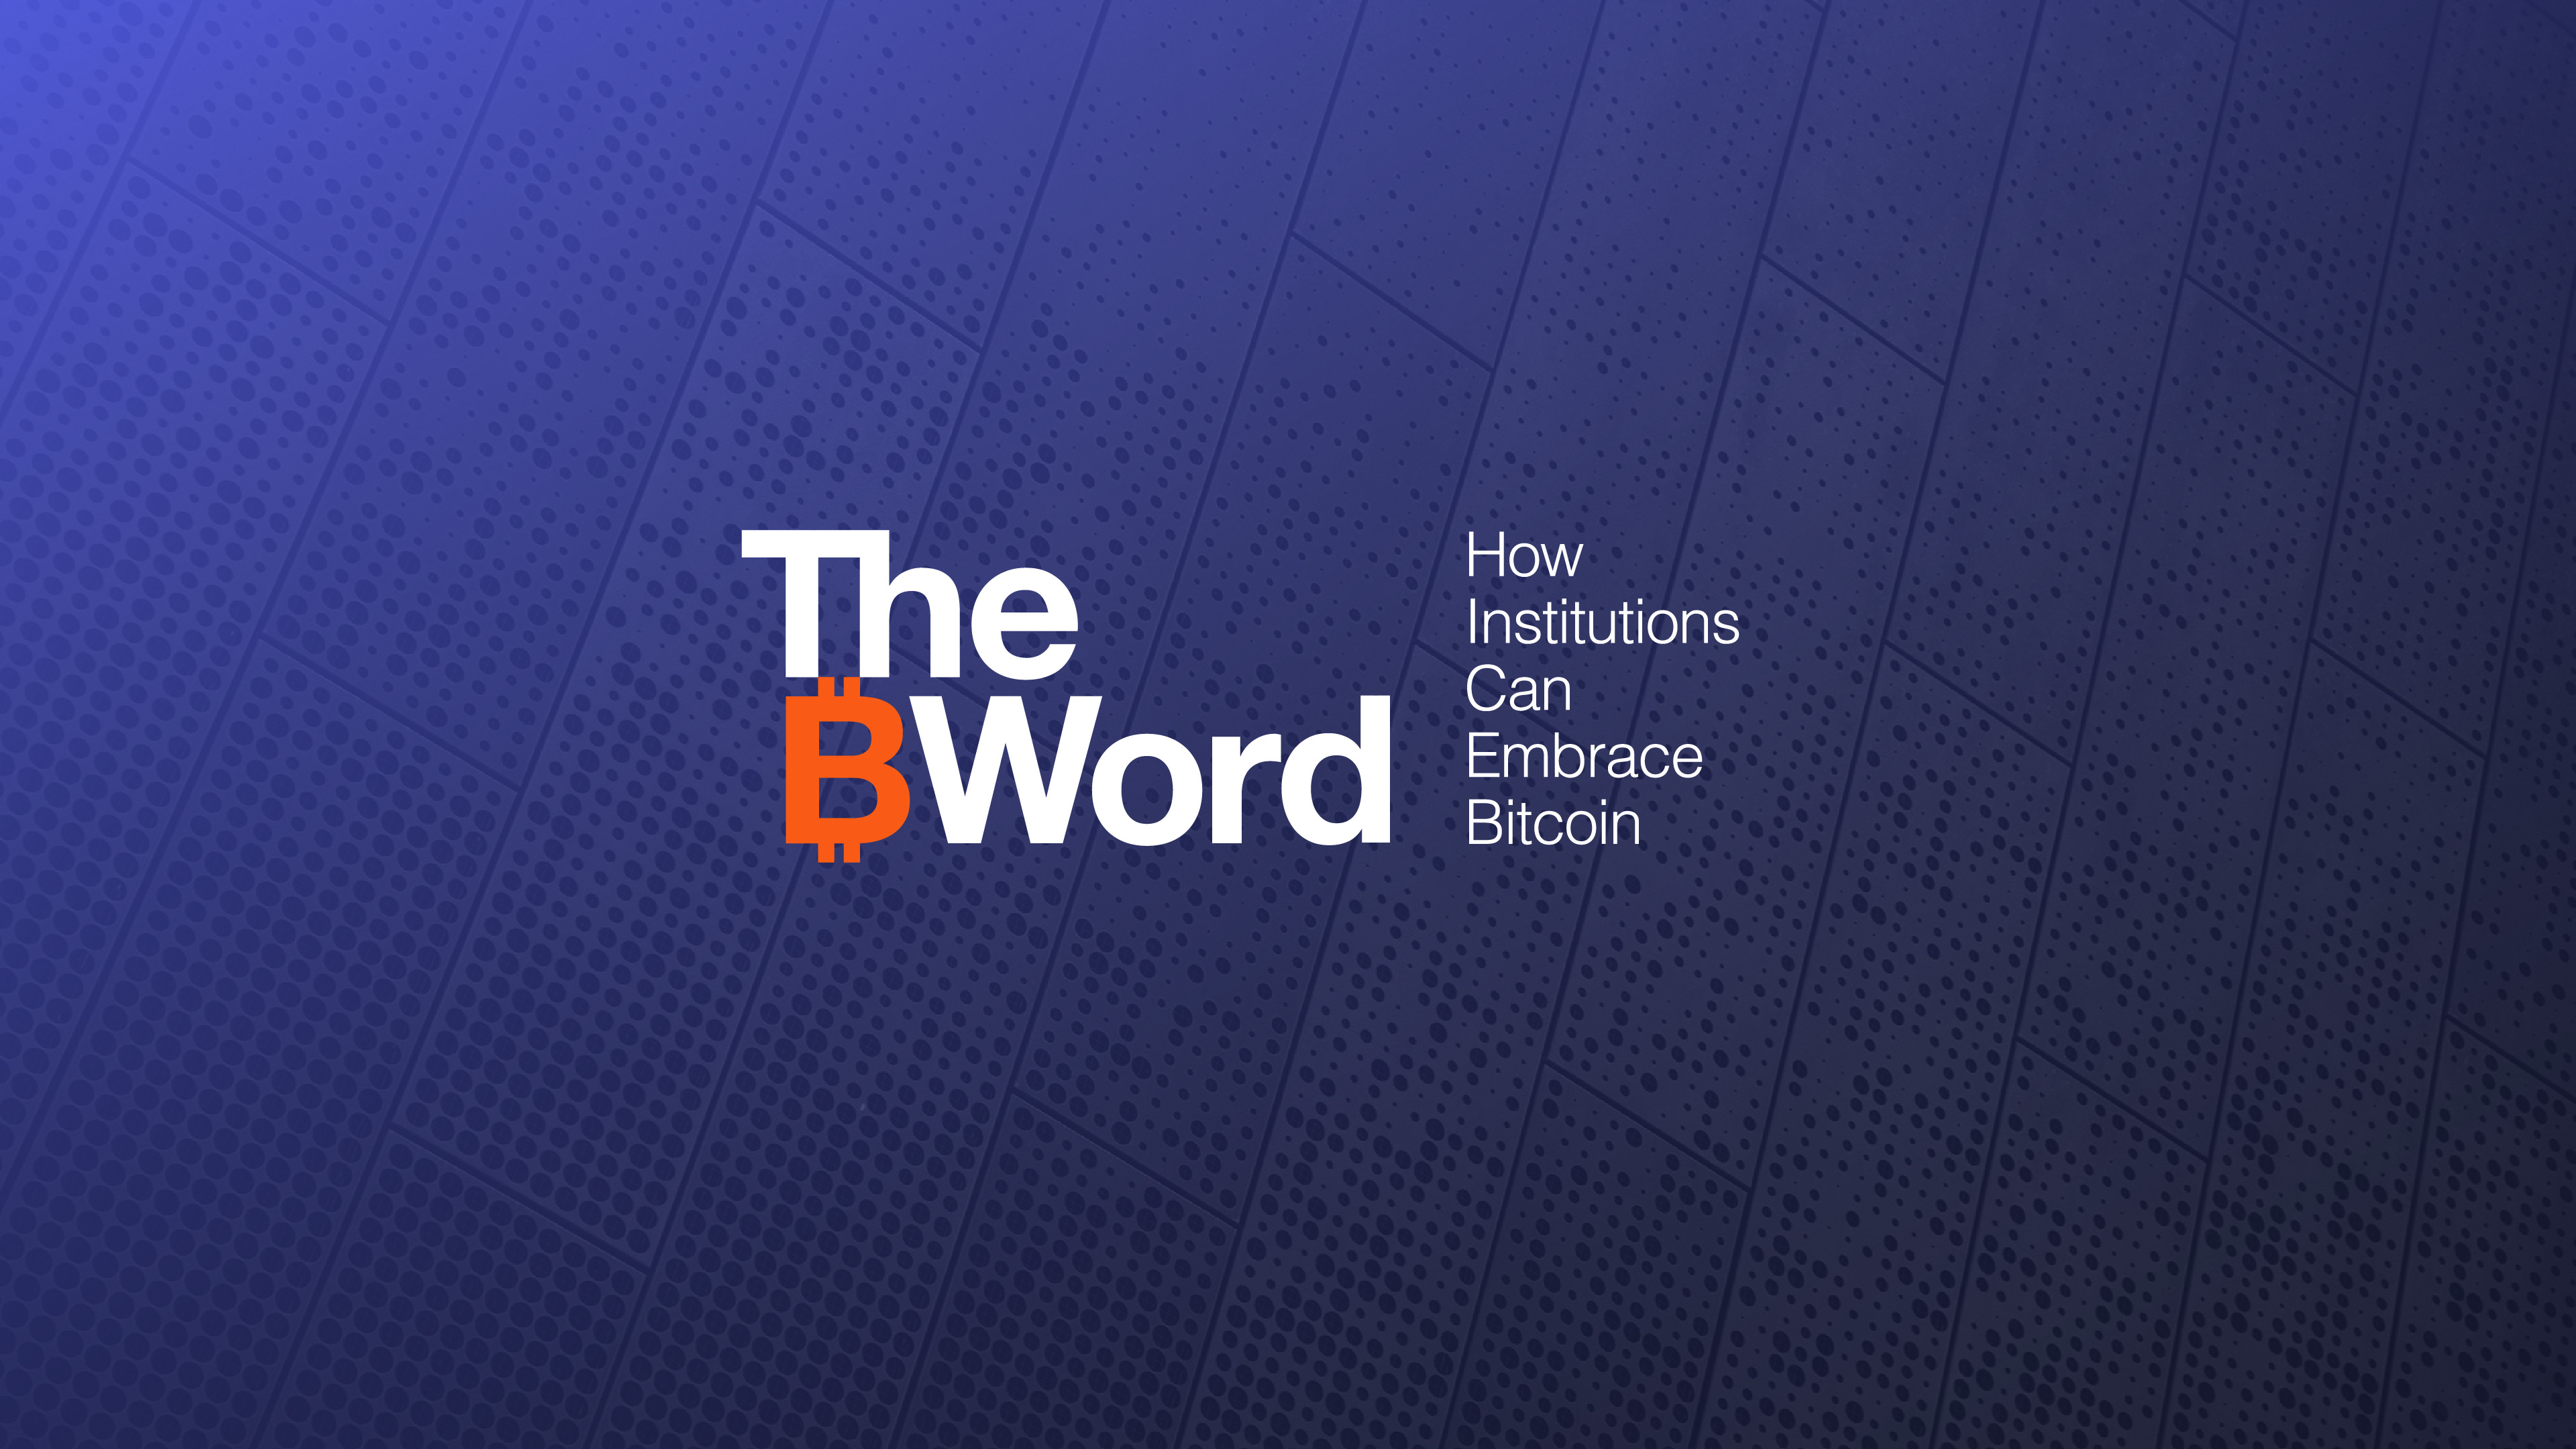 www.thebword.org